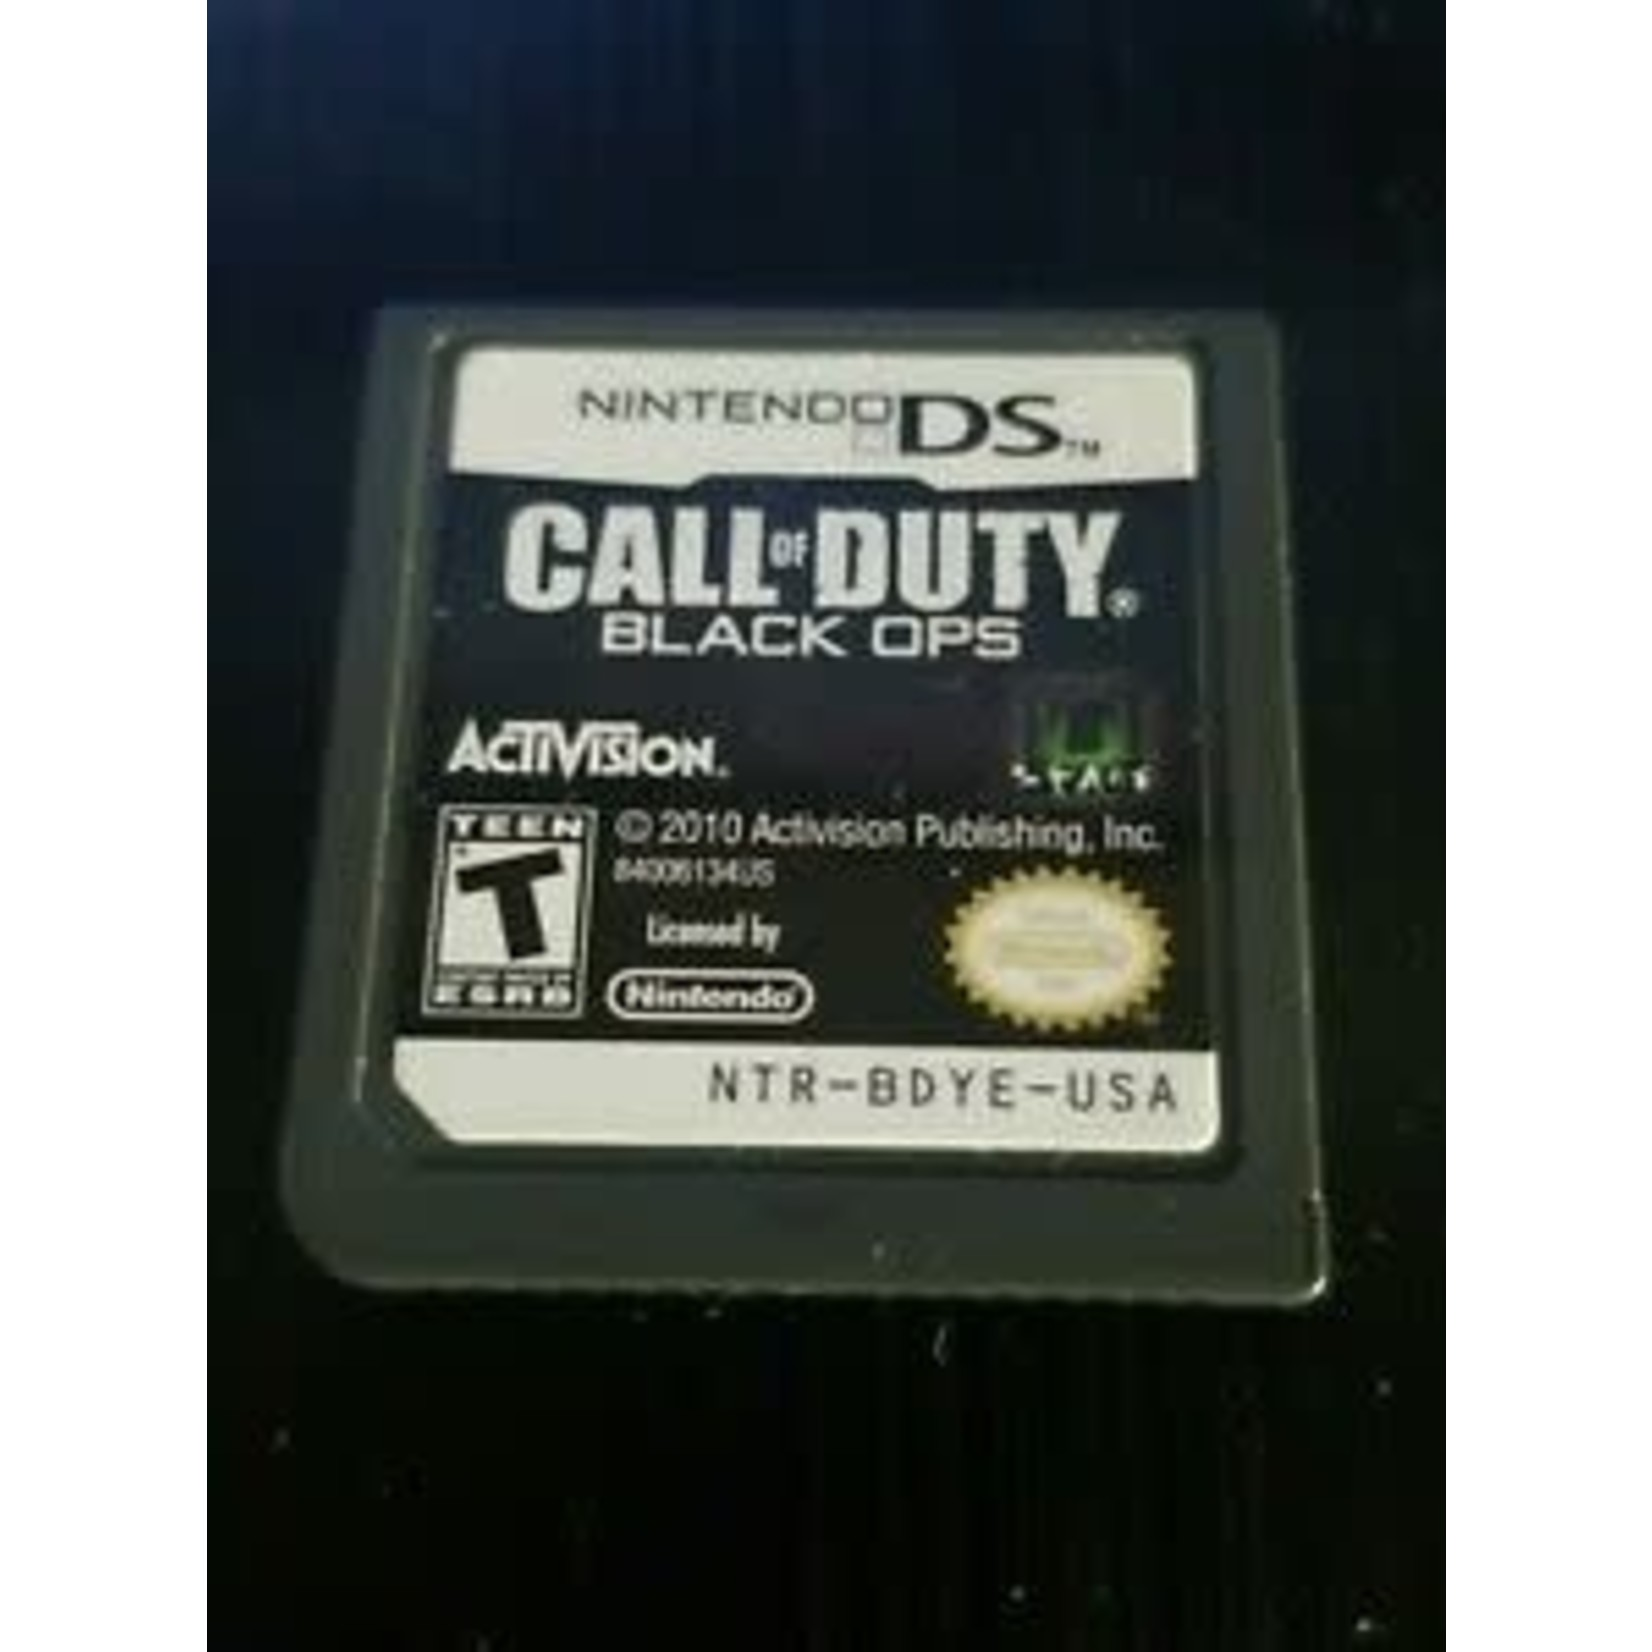 DSU-Call of Dut Black Ops (cartridge)